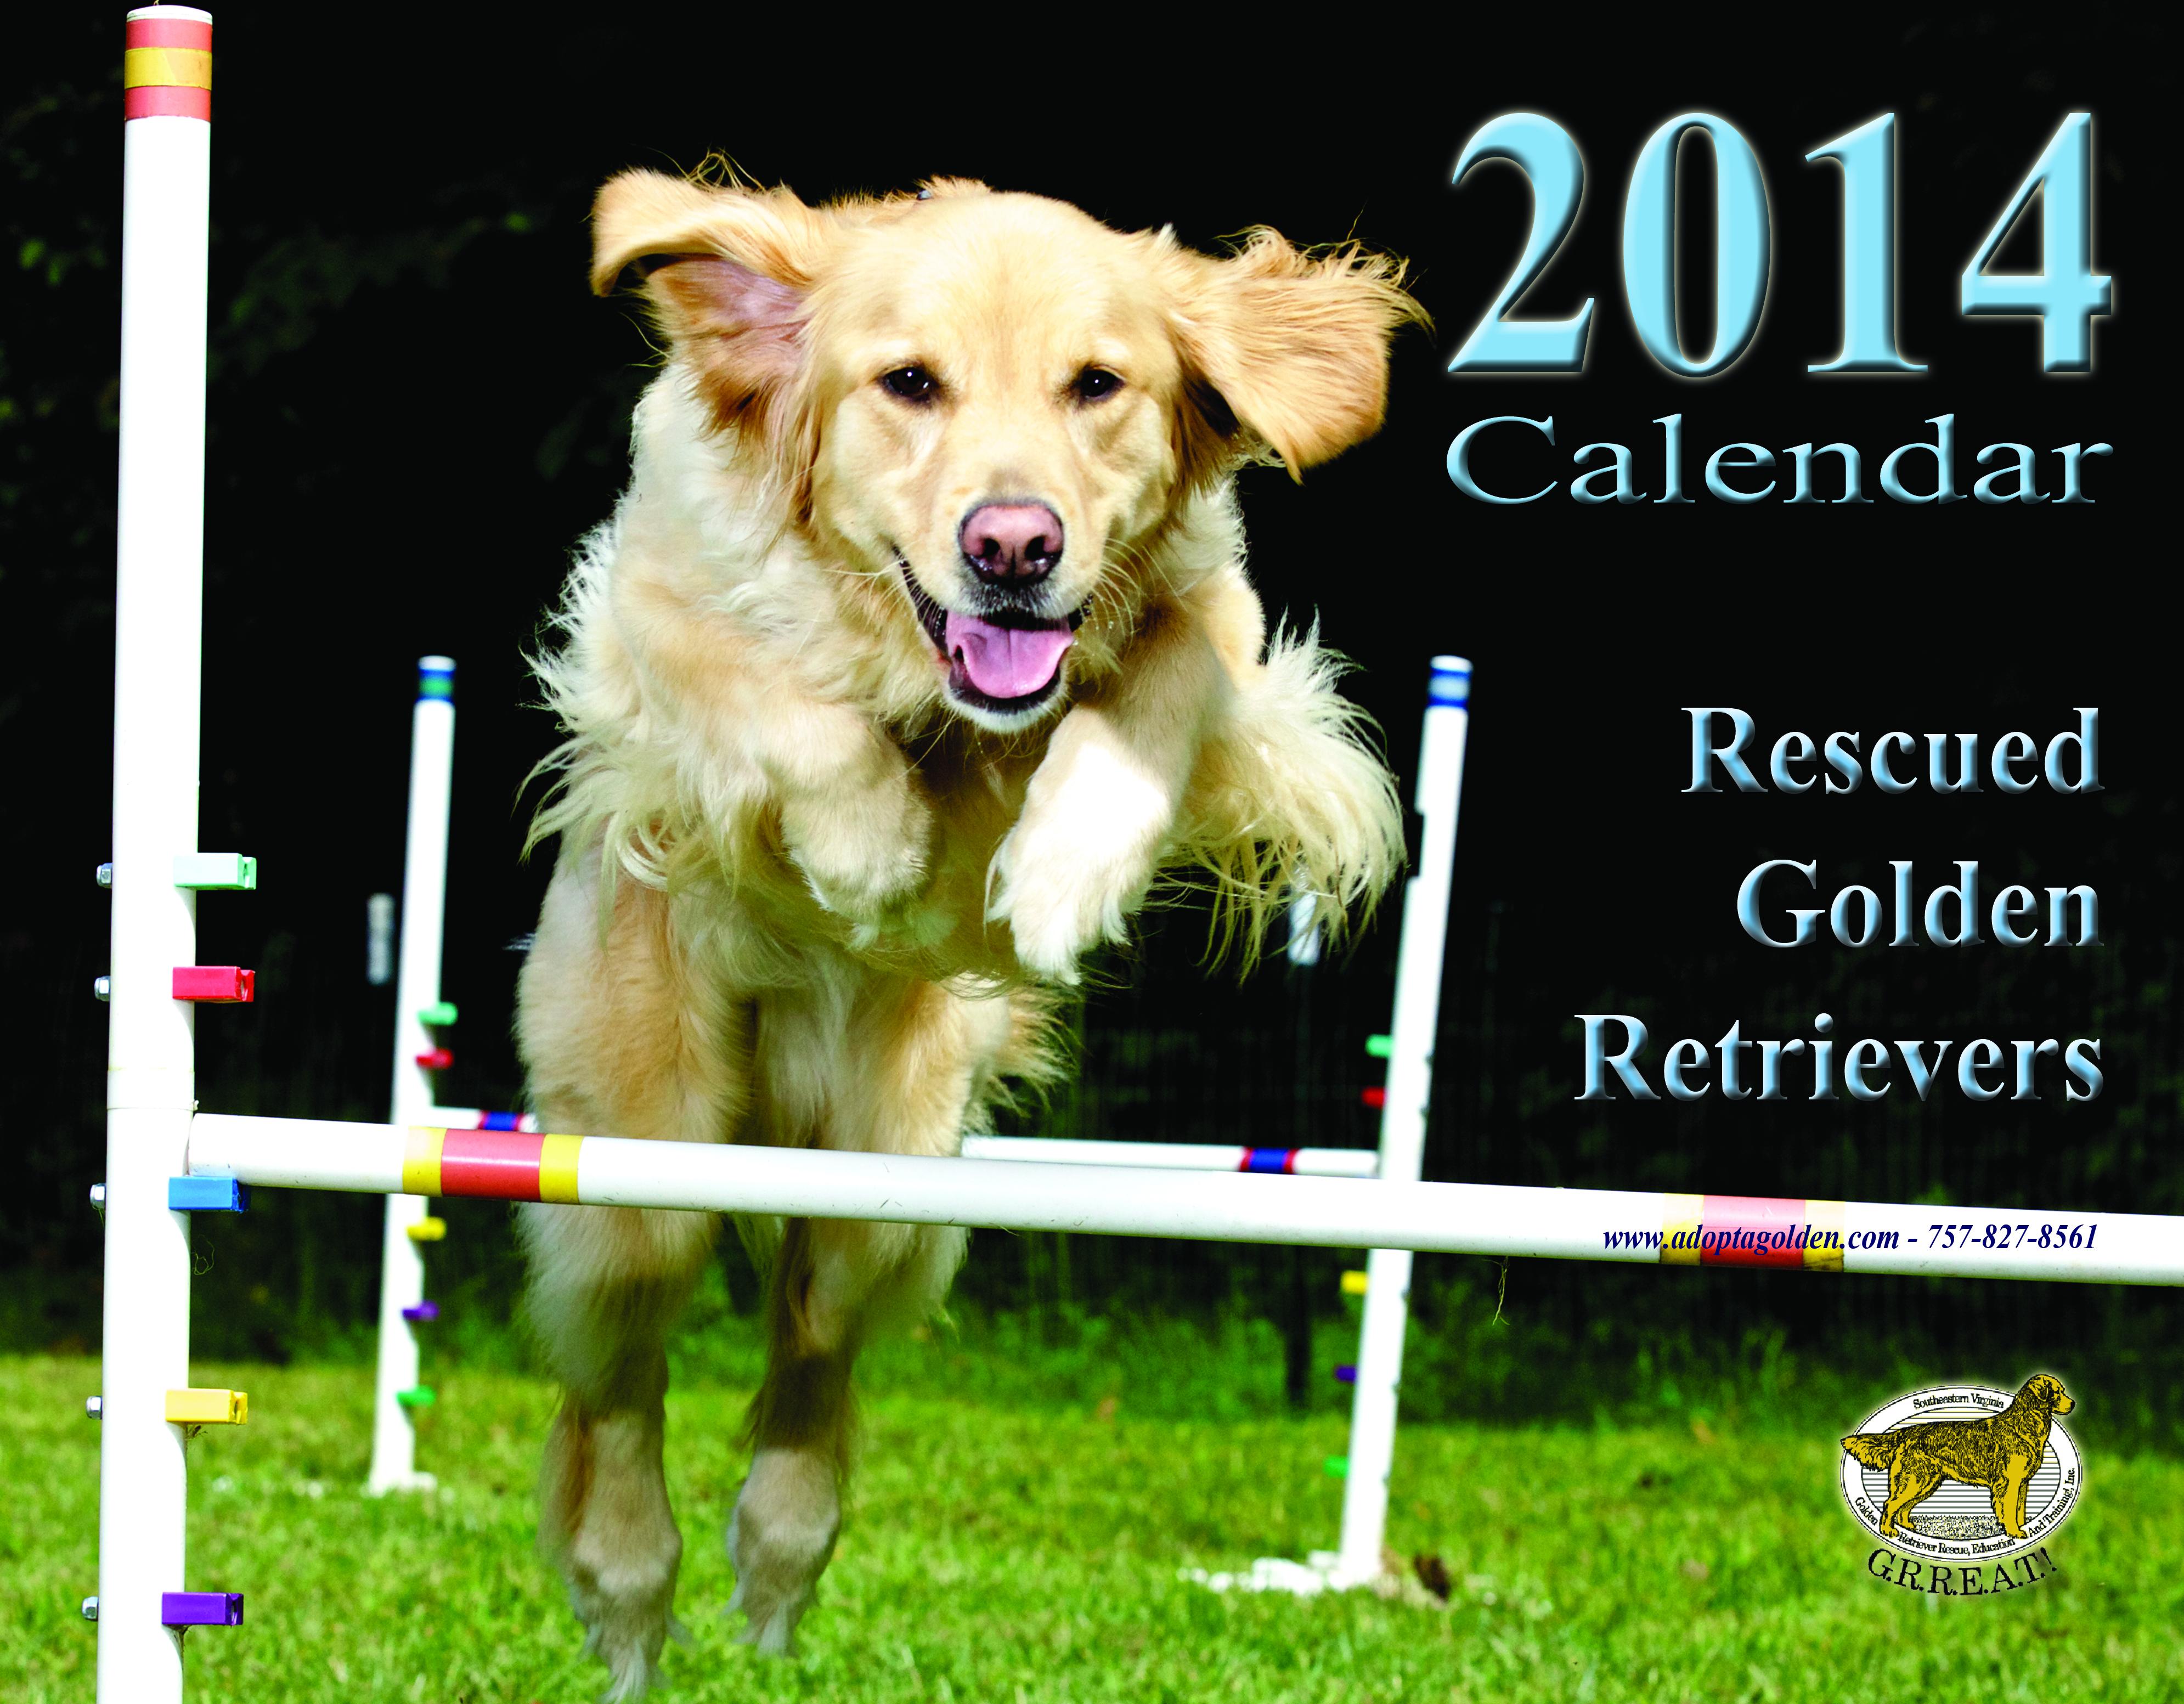 Pictures Needed For  Calendar Grreattimes